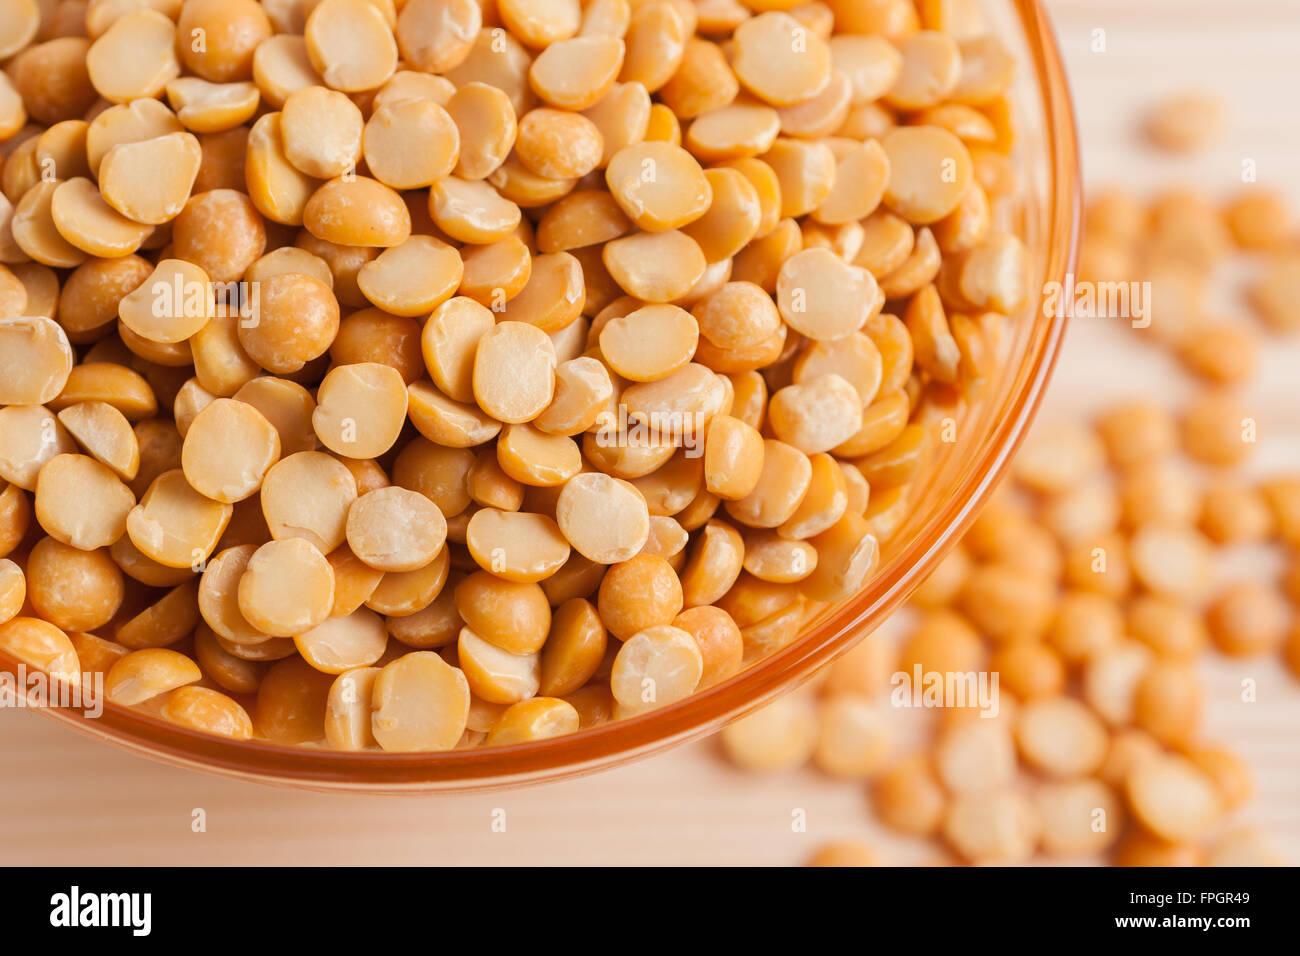 Yellow split peas used to make split pea soup and pease pudding - Stock Image